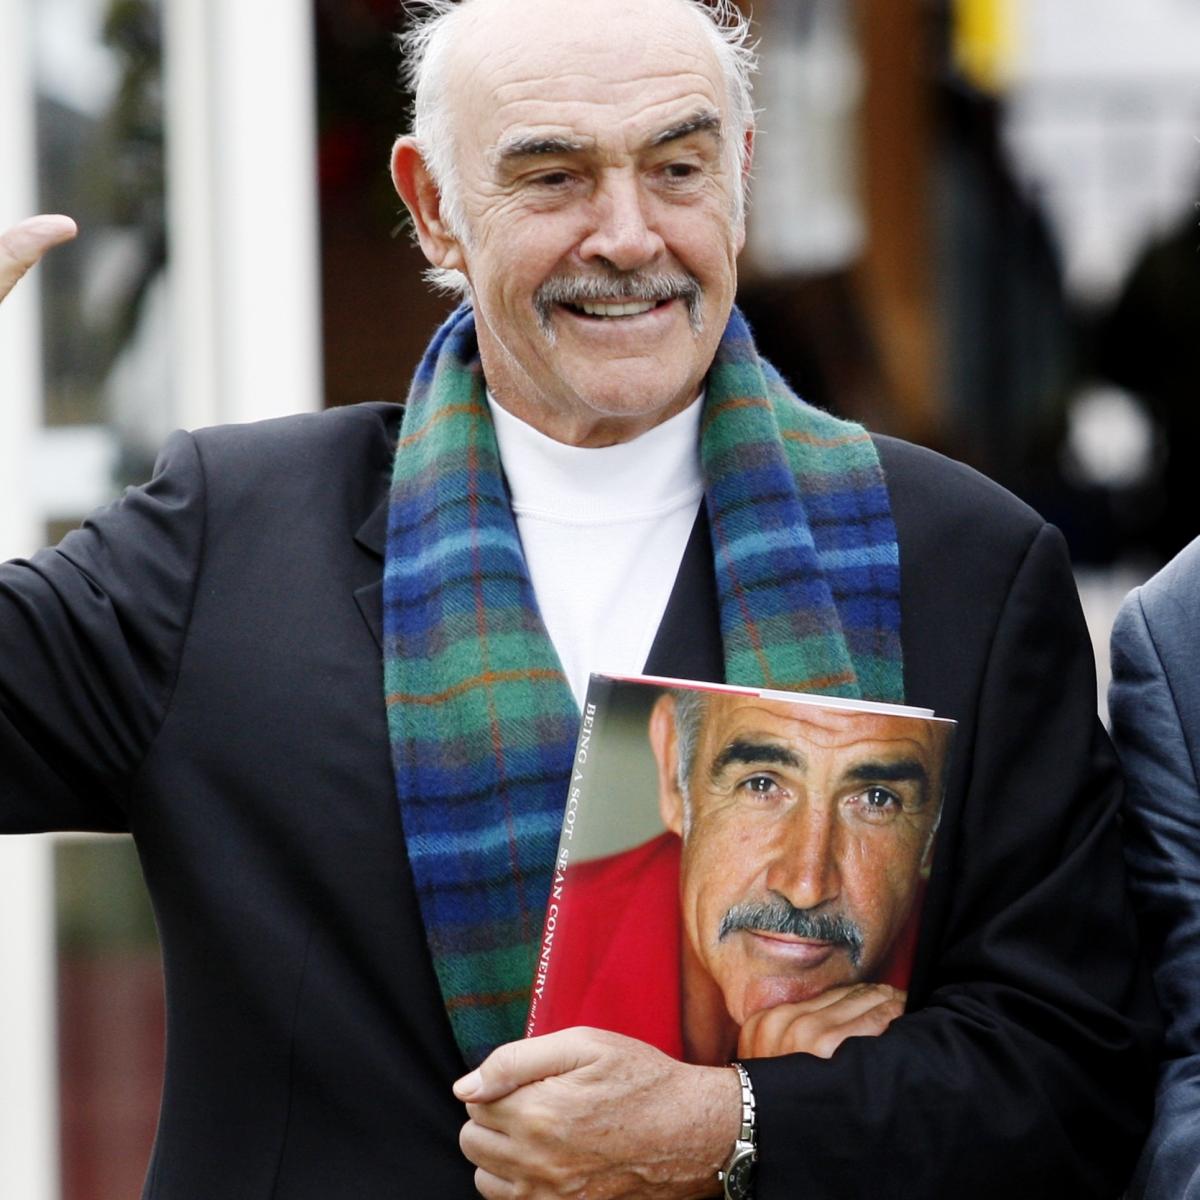 Sean Connery, the original James Bond dies at 90